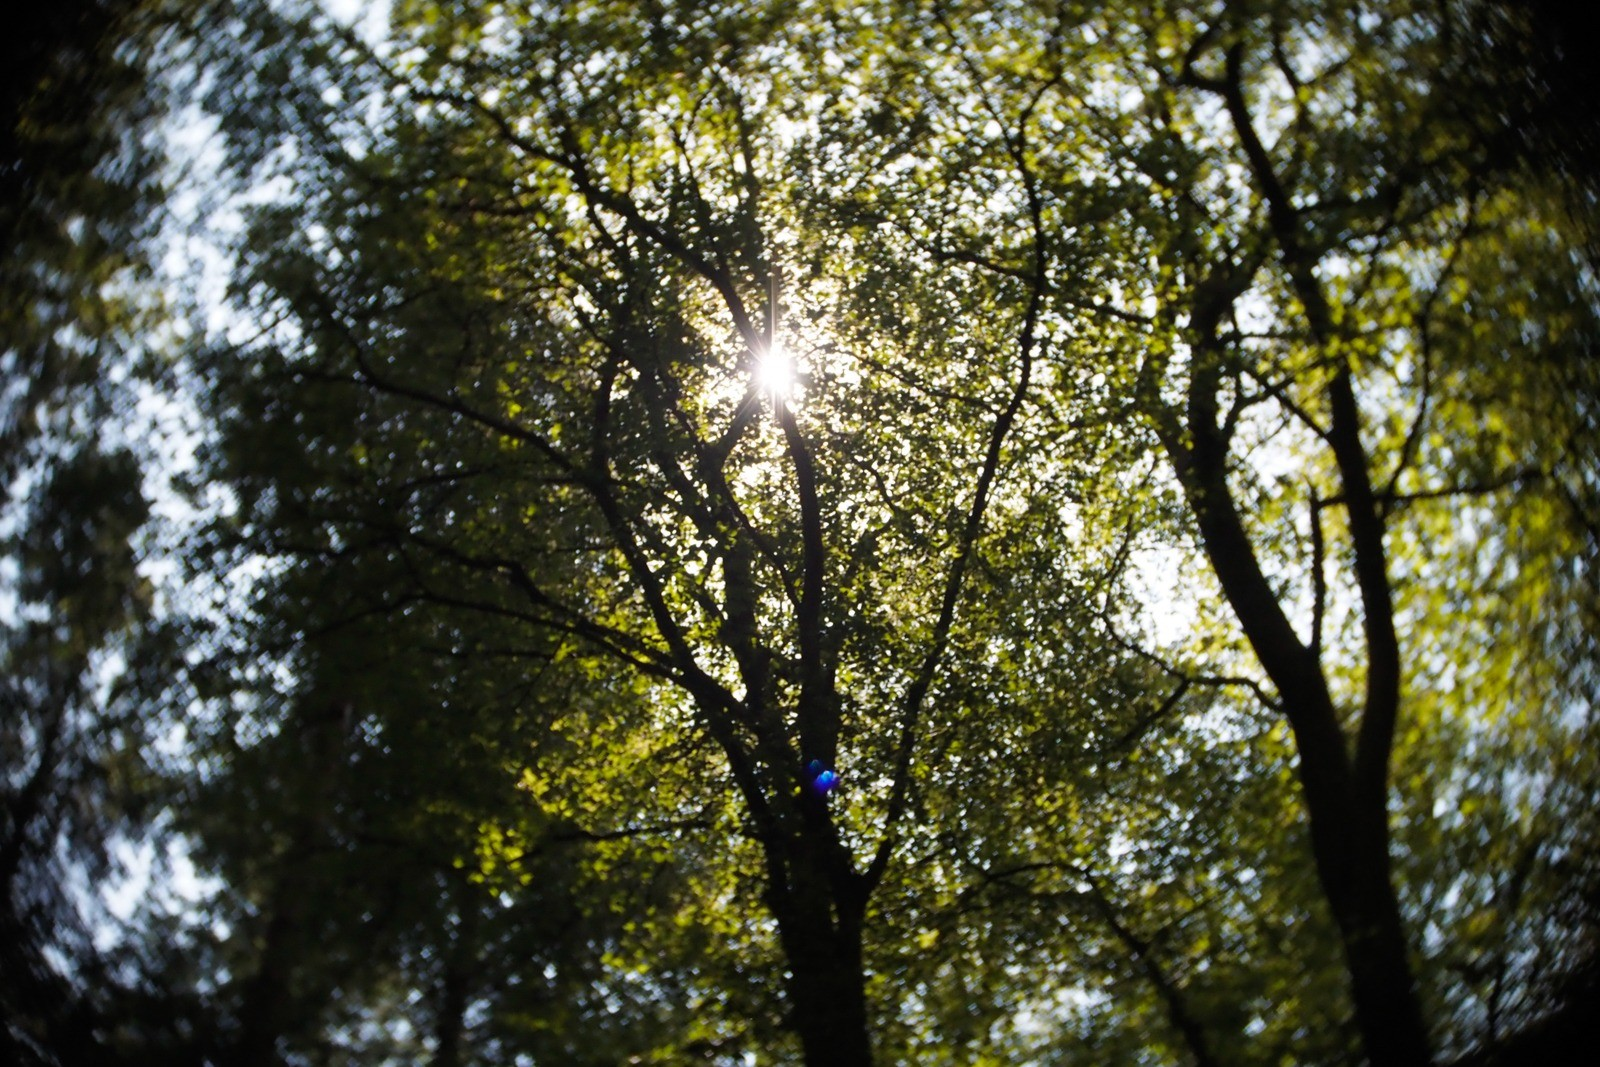 I skoven, Almindingen, Bornholm, fotograferet med et SLR Magic Toy Lens